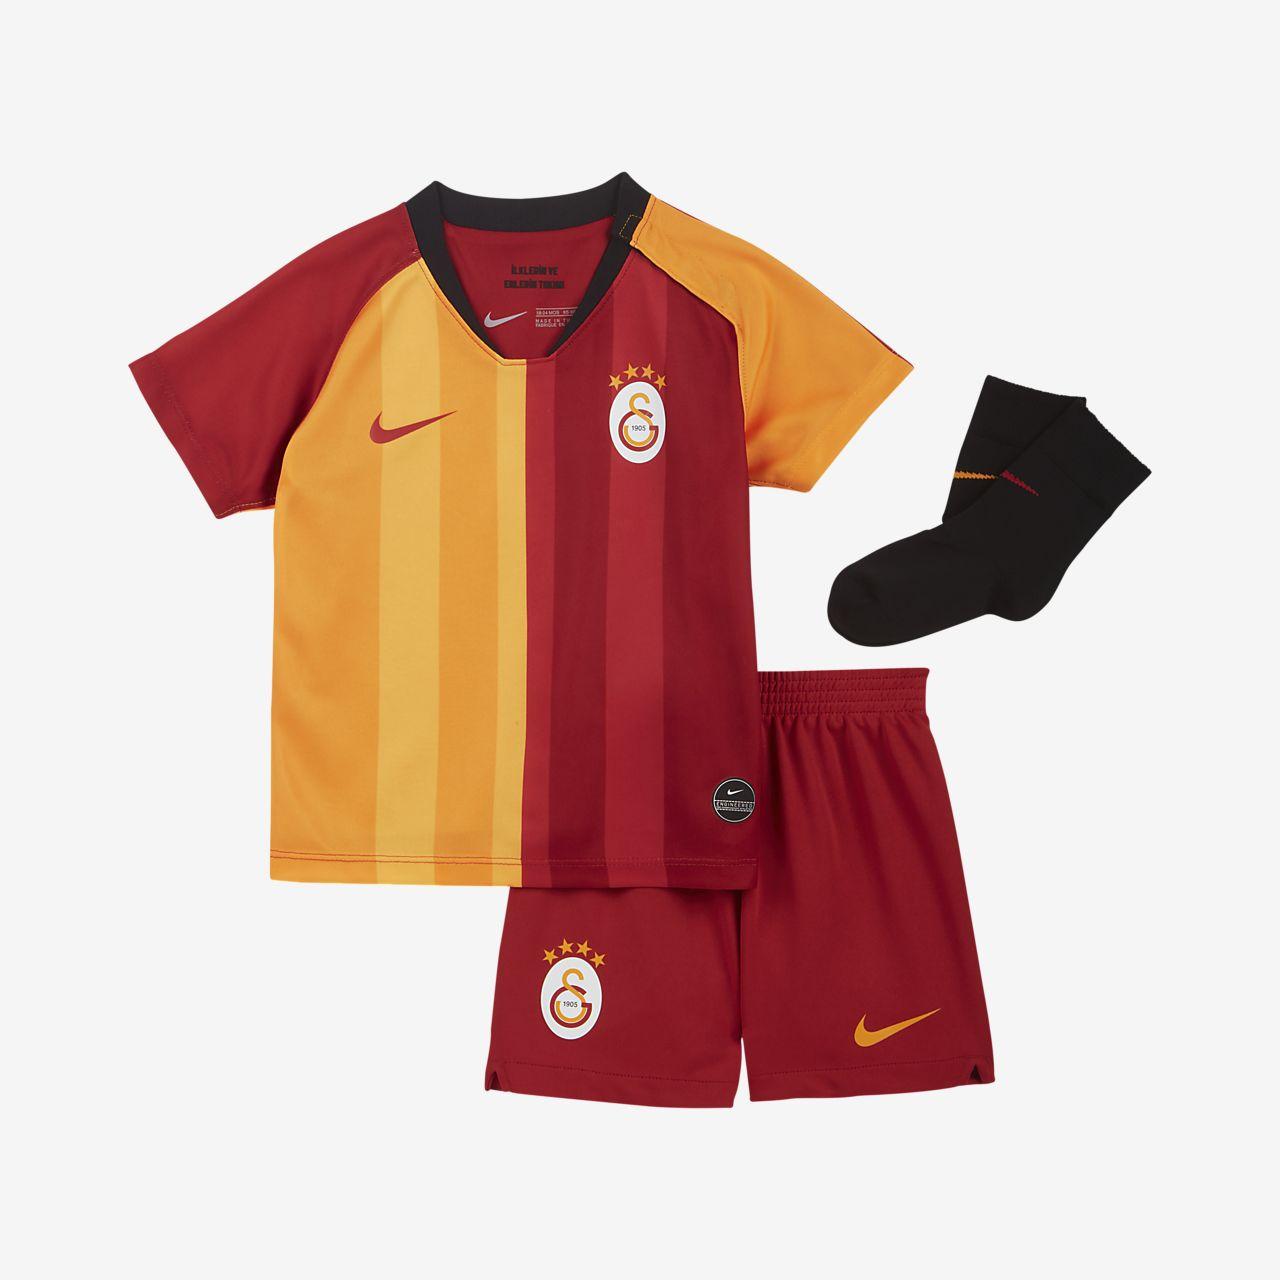 Galatasaray 2019/20 Home fotballsett til spedbarn/småbarn